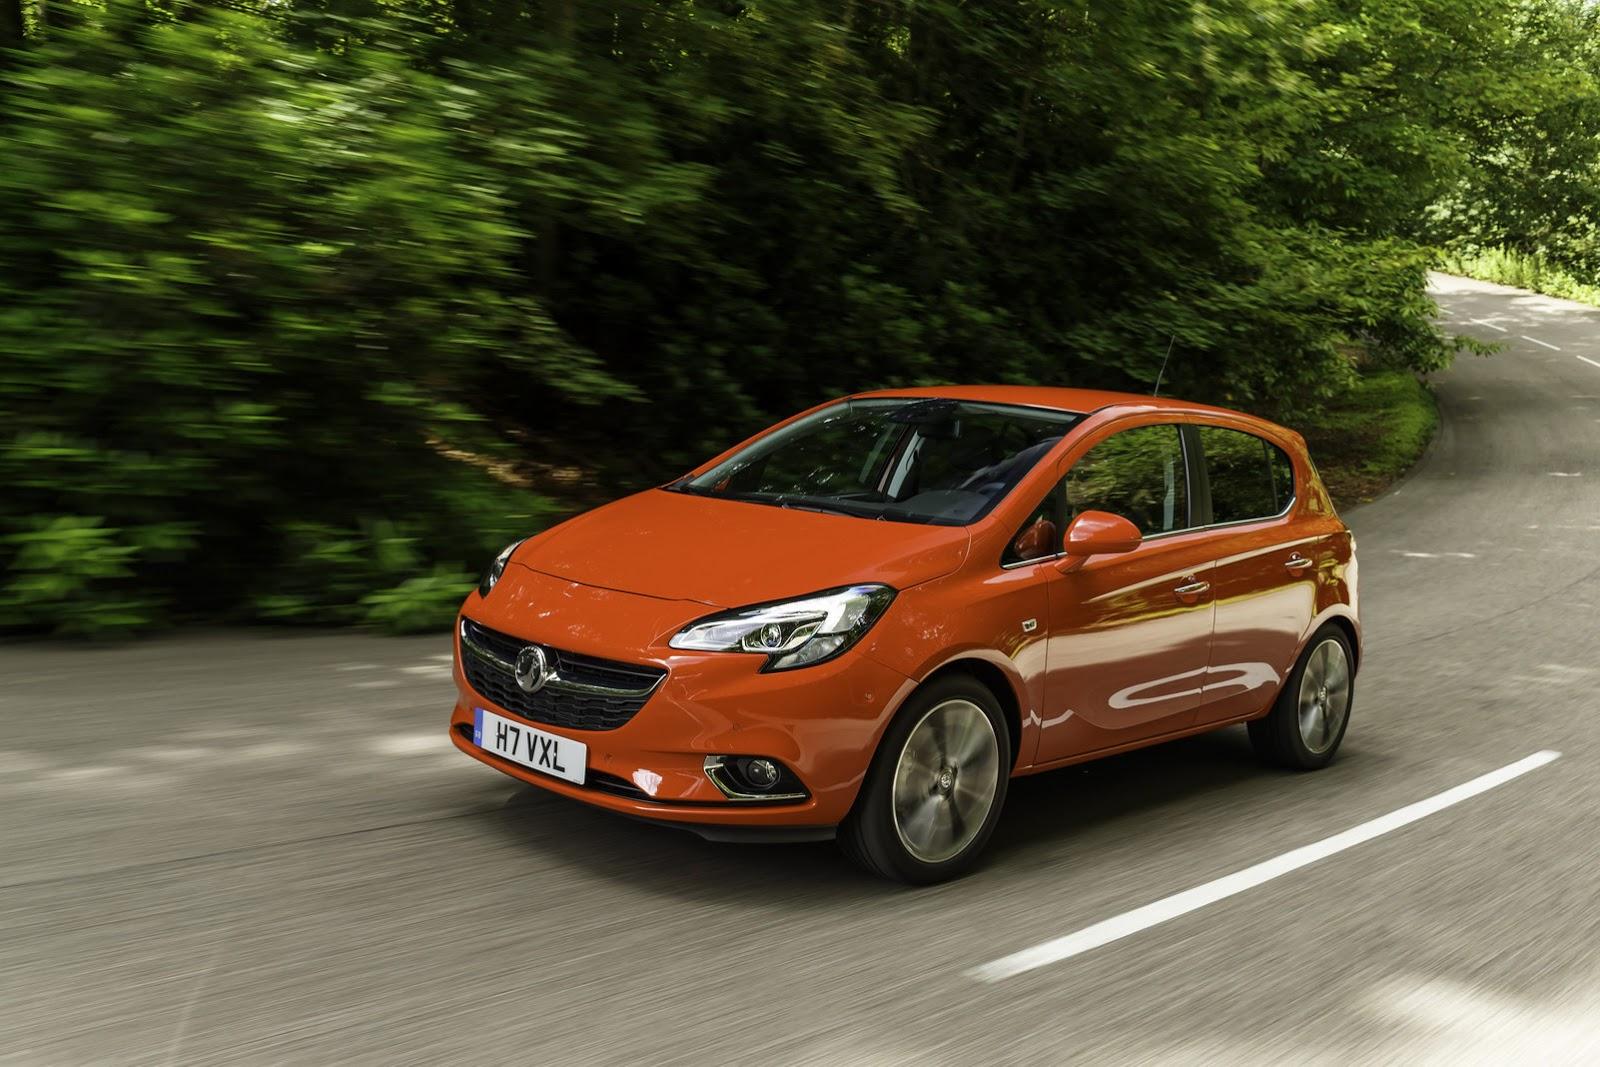 Opel Corsa 1 0 Ecotec Turbo Vs Ford Fiesta 1 0 Ecoboost